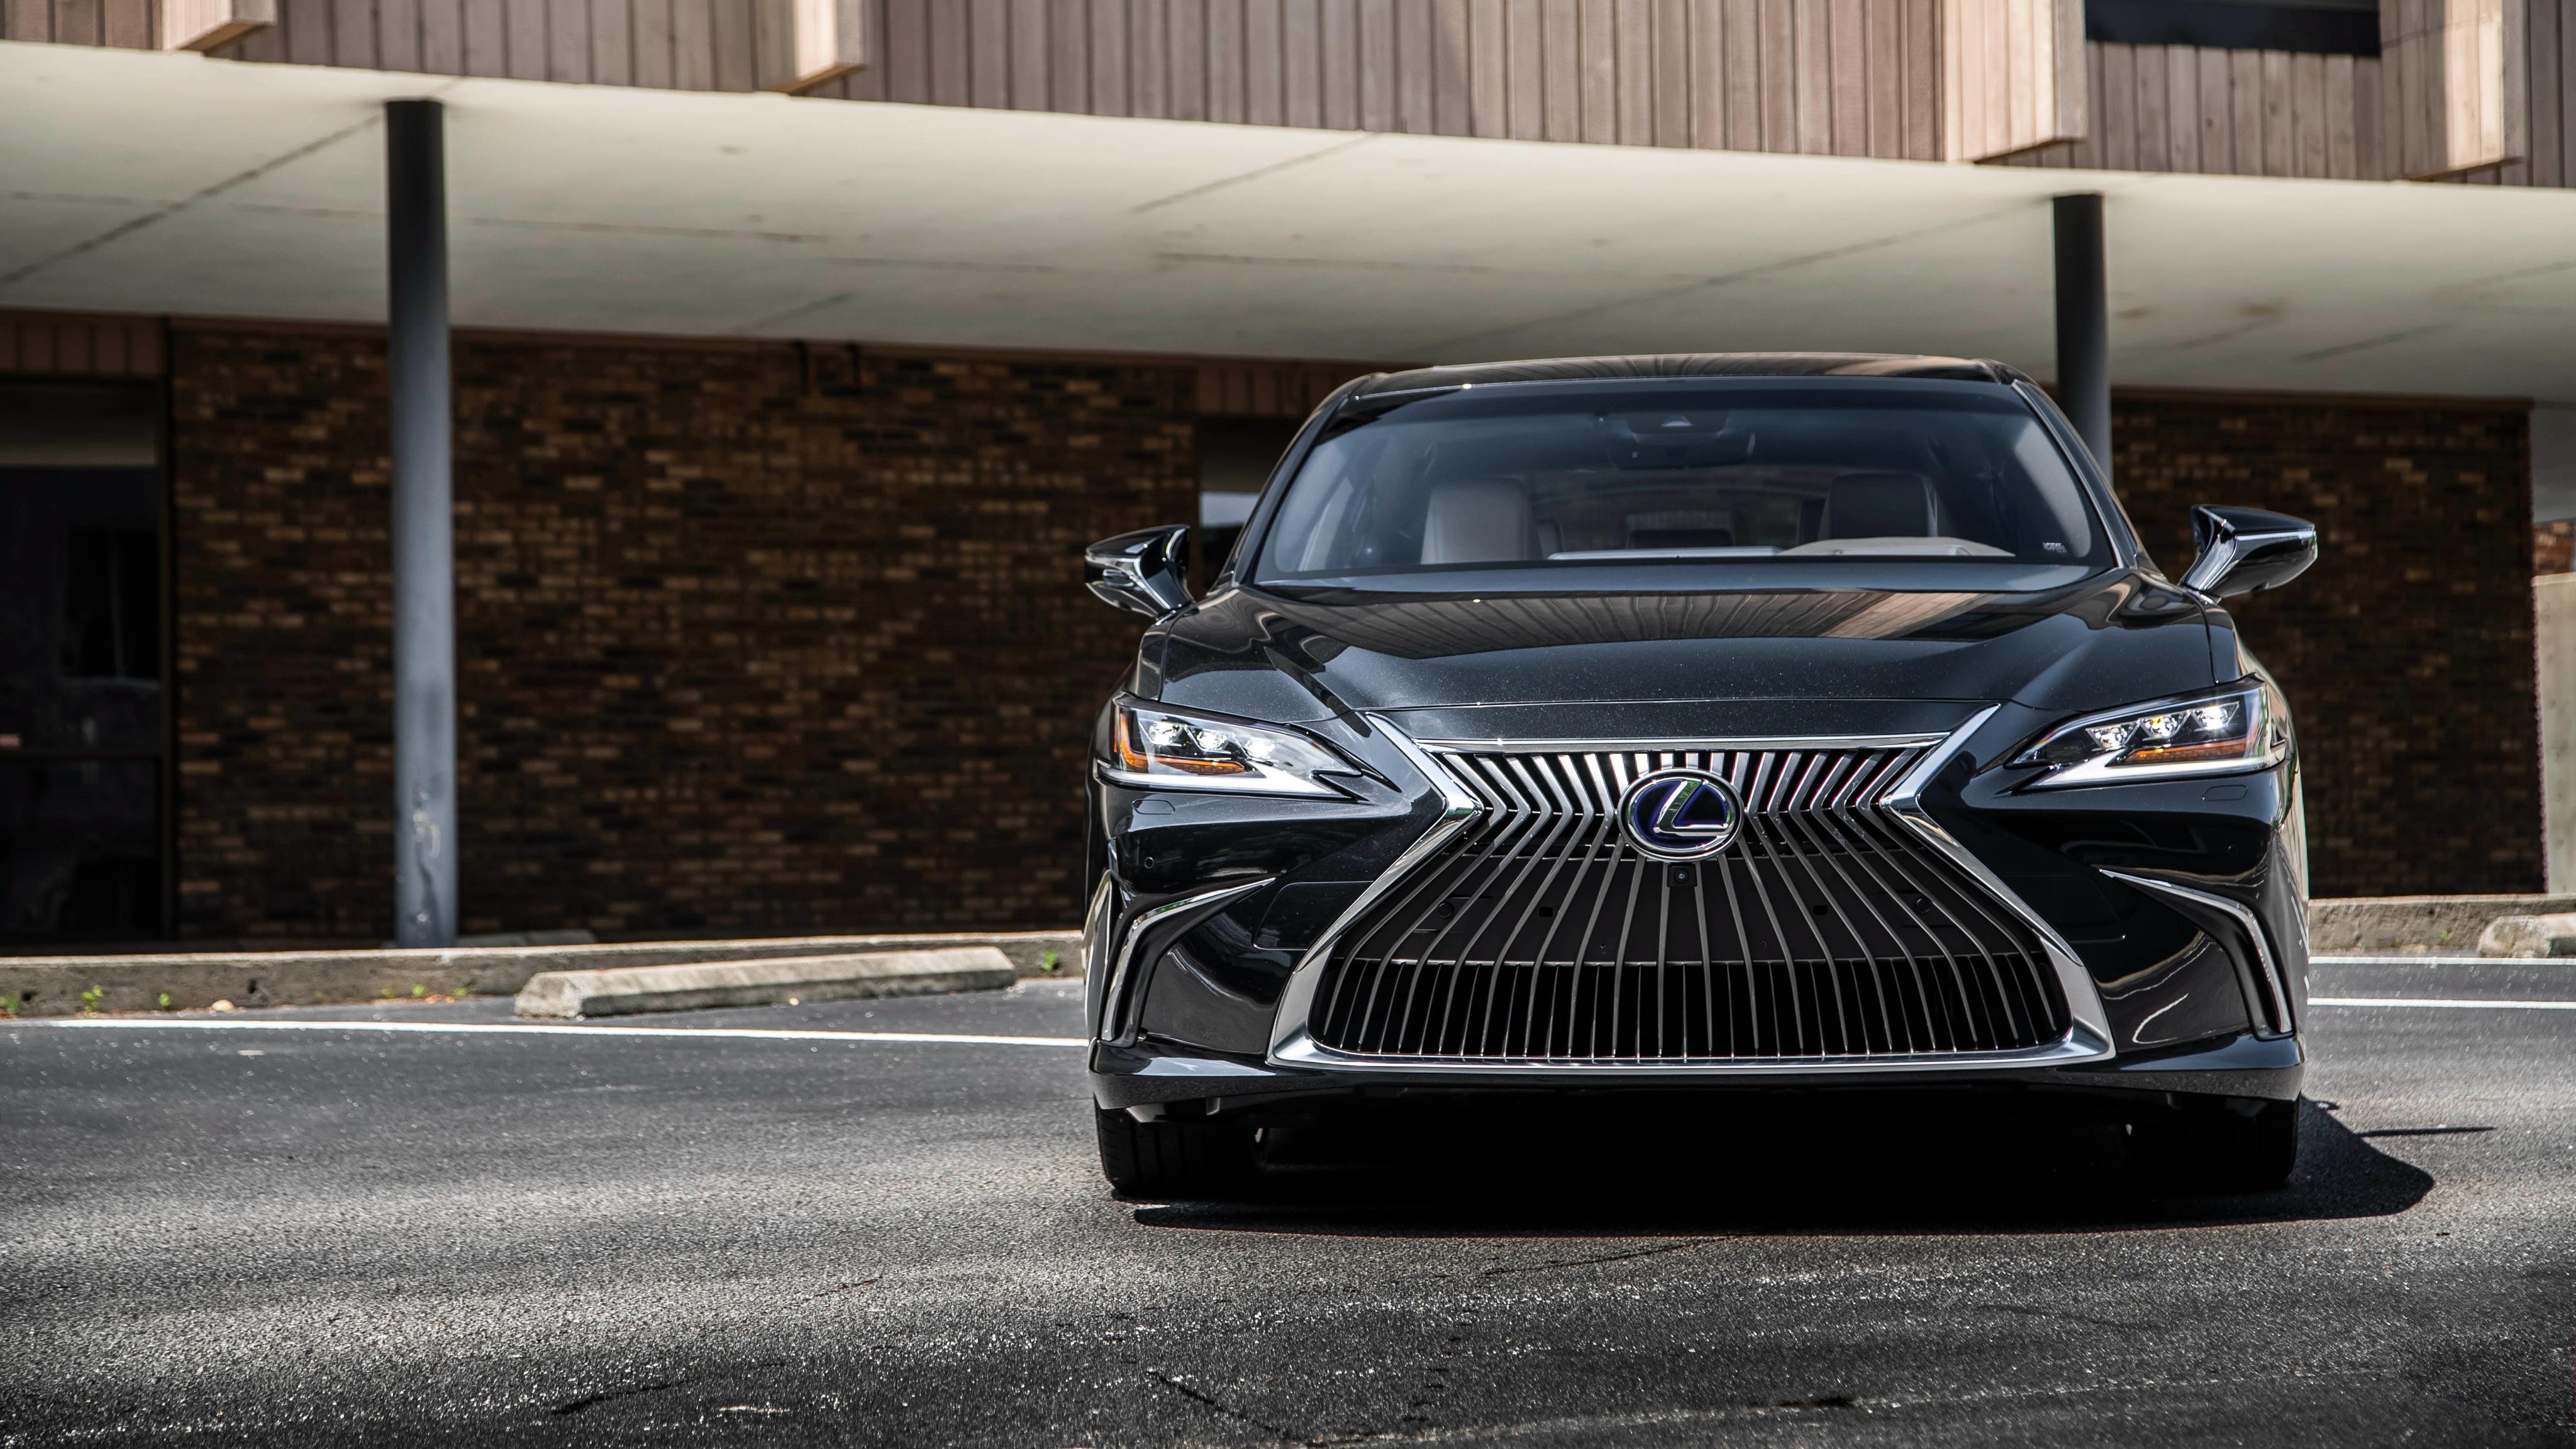 2019 Lexus ES 300h 4K Wallpaper   HD Car Wallpapers   ID ...